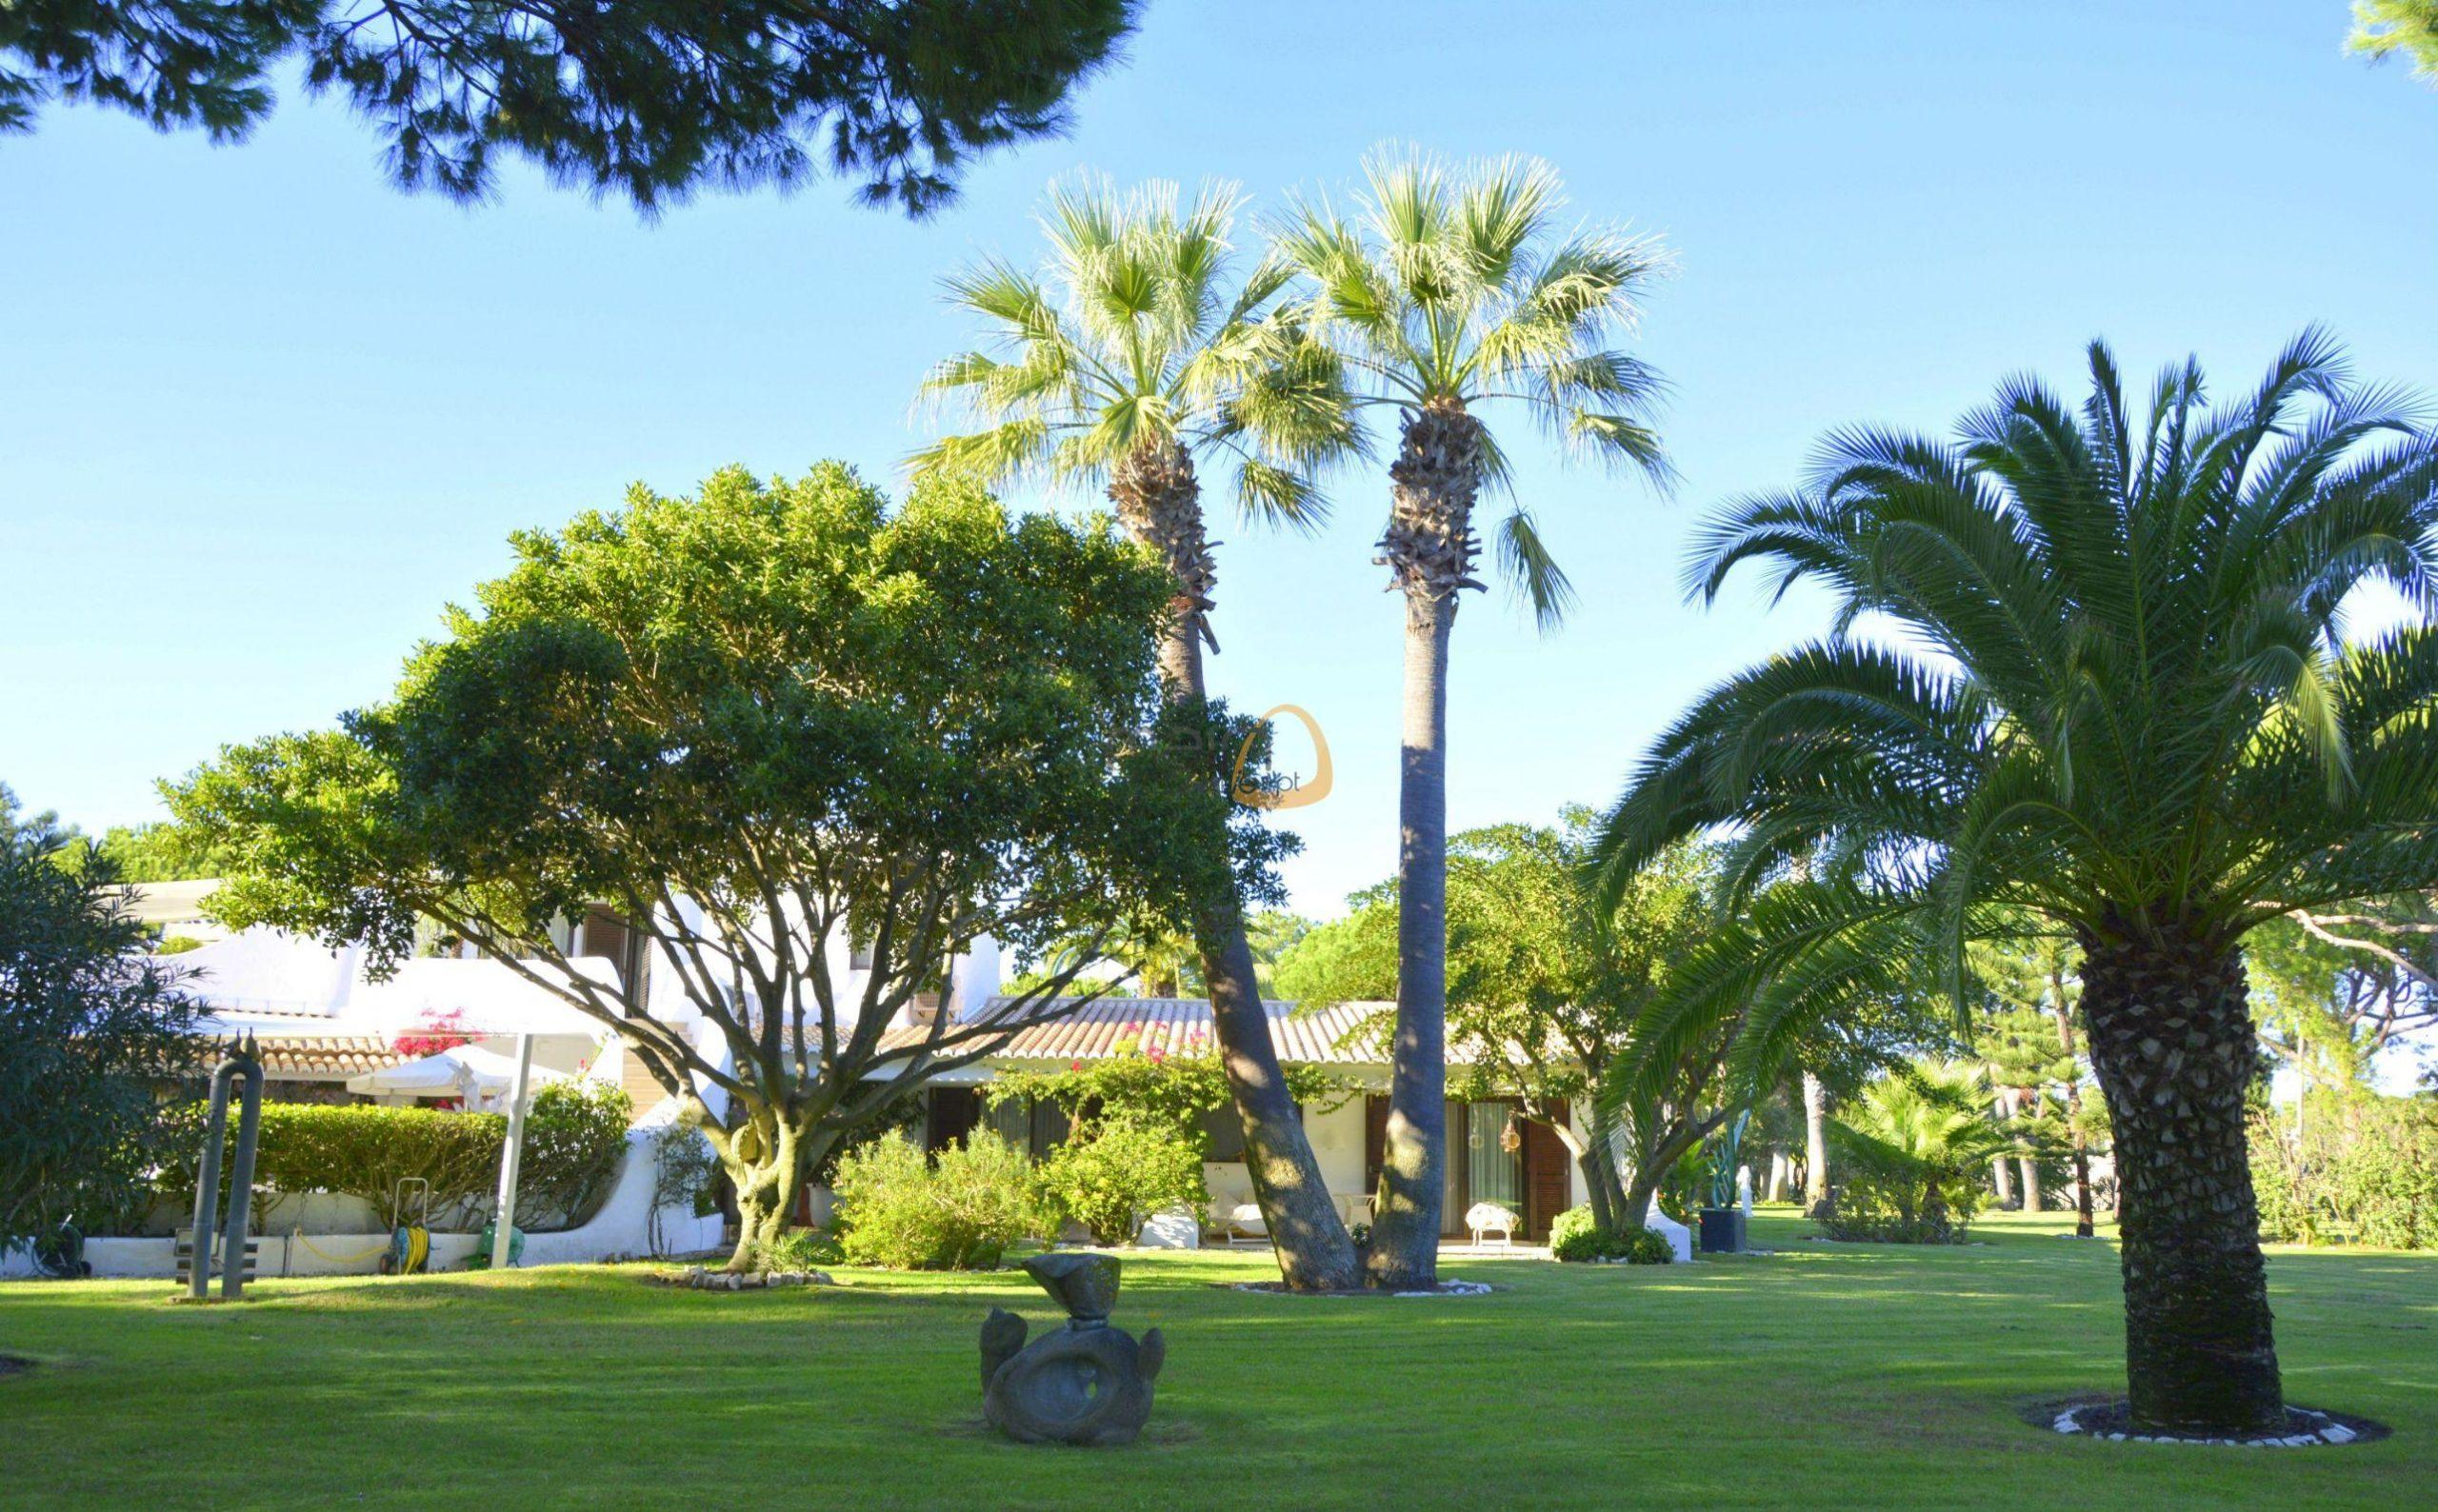 [:pt]Moradia com 5 quartos na Quinta do Lago :: Jardim 5 :: MainProperties :: 020061[:en]villa-quinta-do-lago-algarve-portugal-020061-10[:]